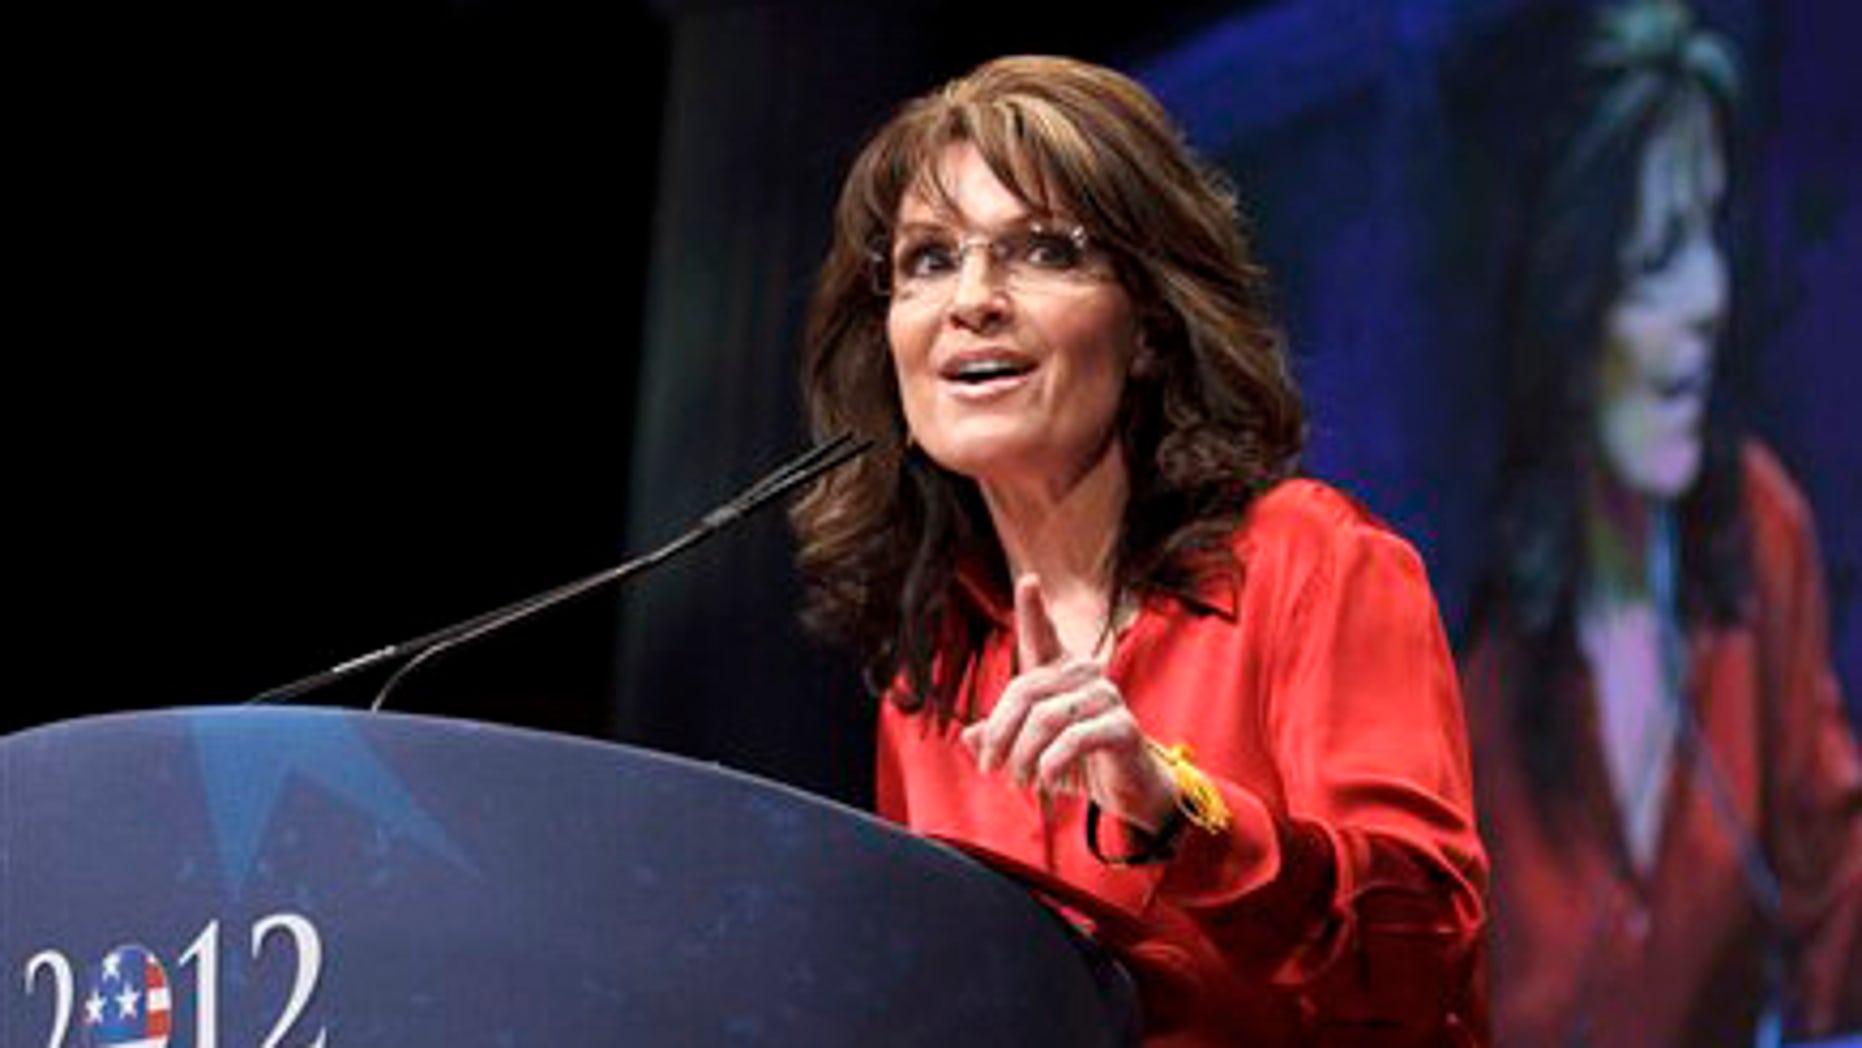 FILE: Feb. 11, 2012:  Former Alaska Gov. and 2008 GOP vice presidential candidate Sarah Palin speaks in Washington, D.C.